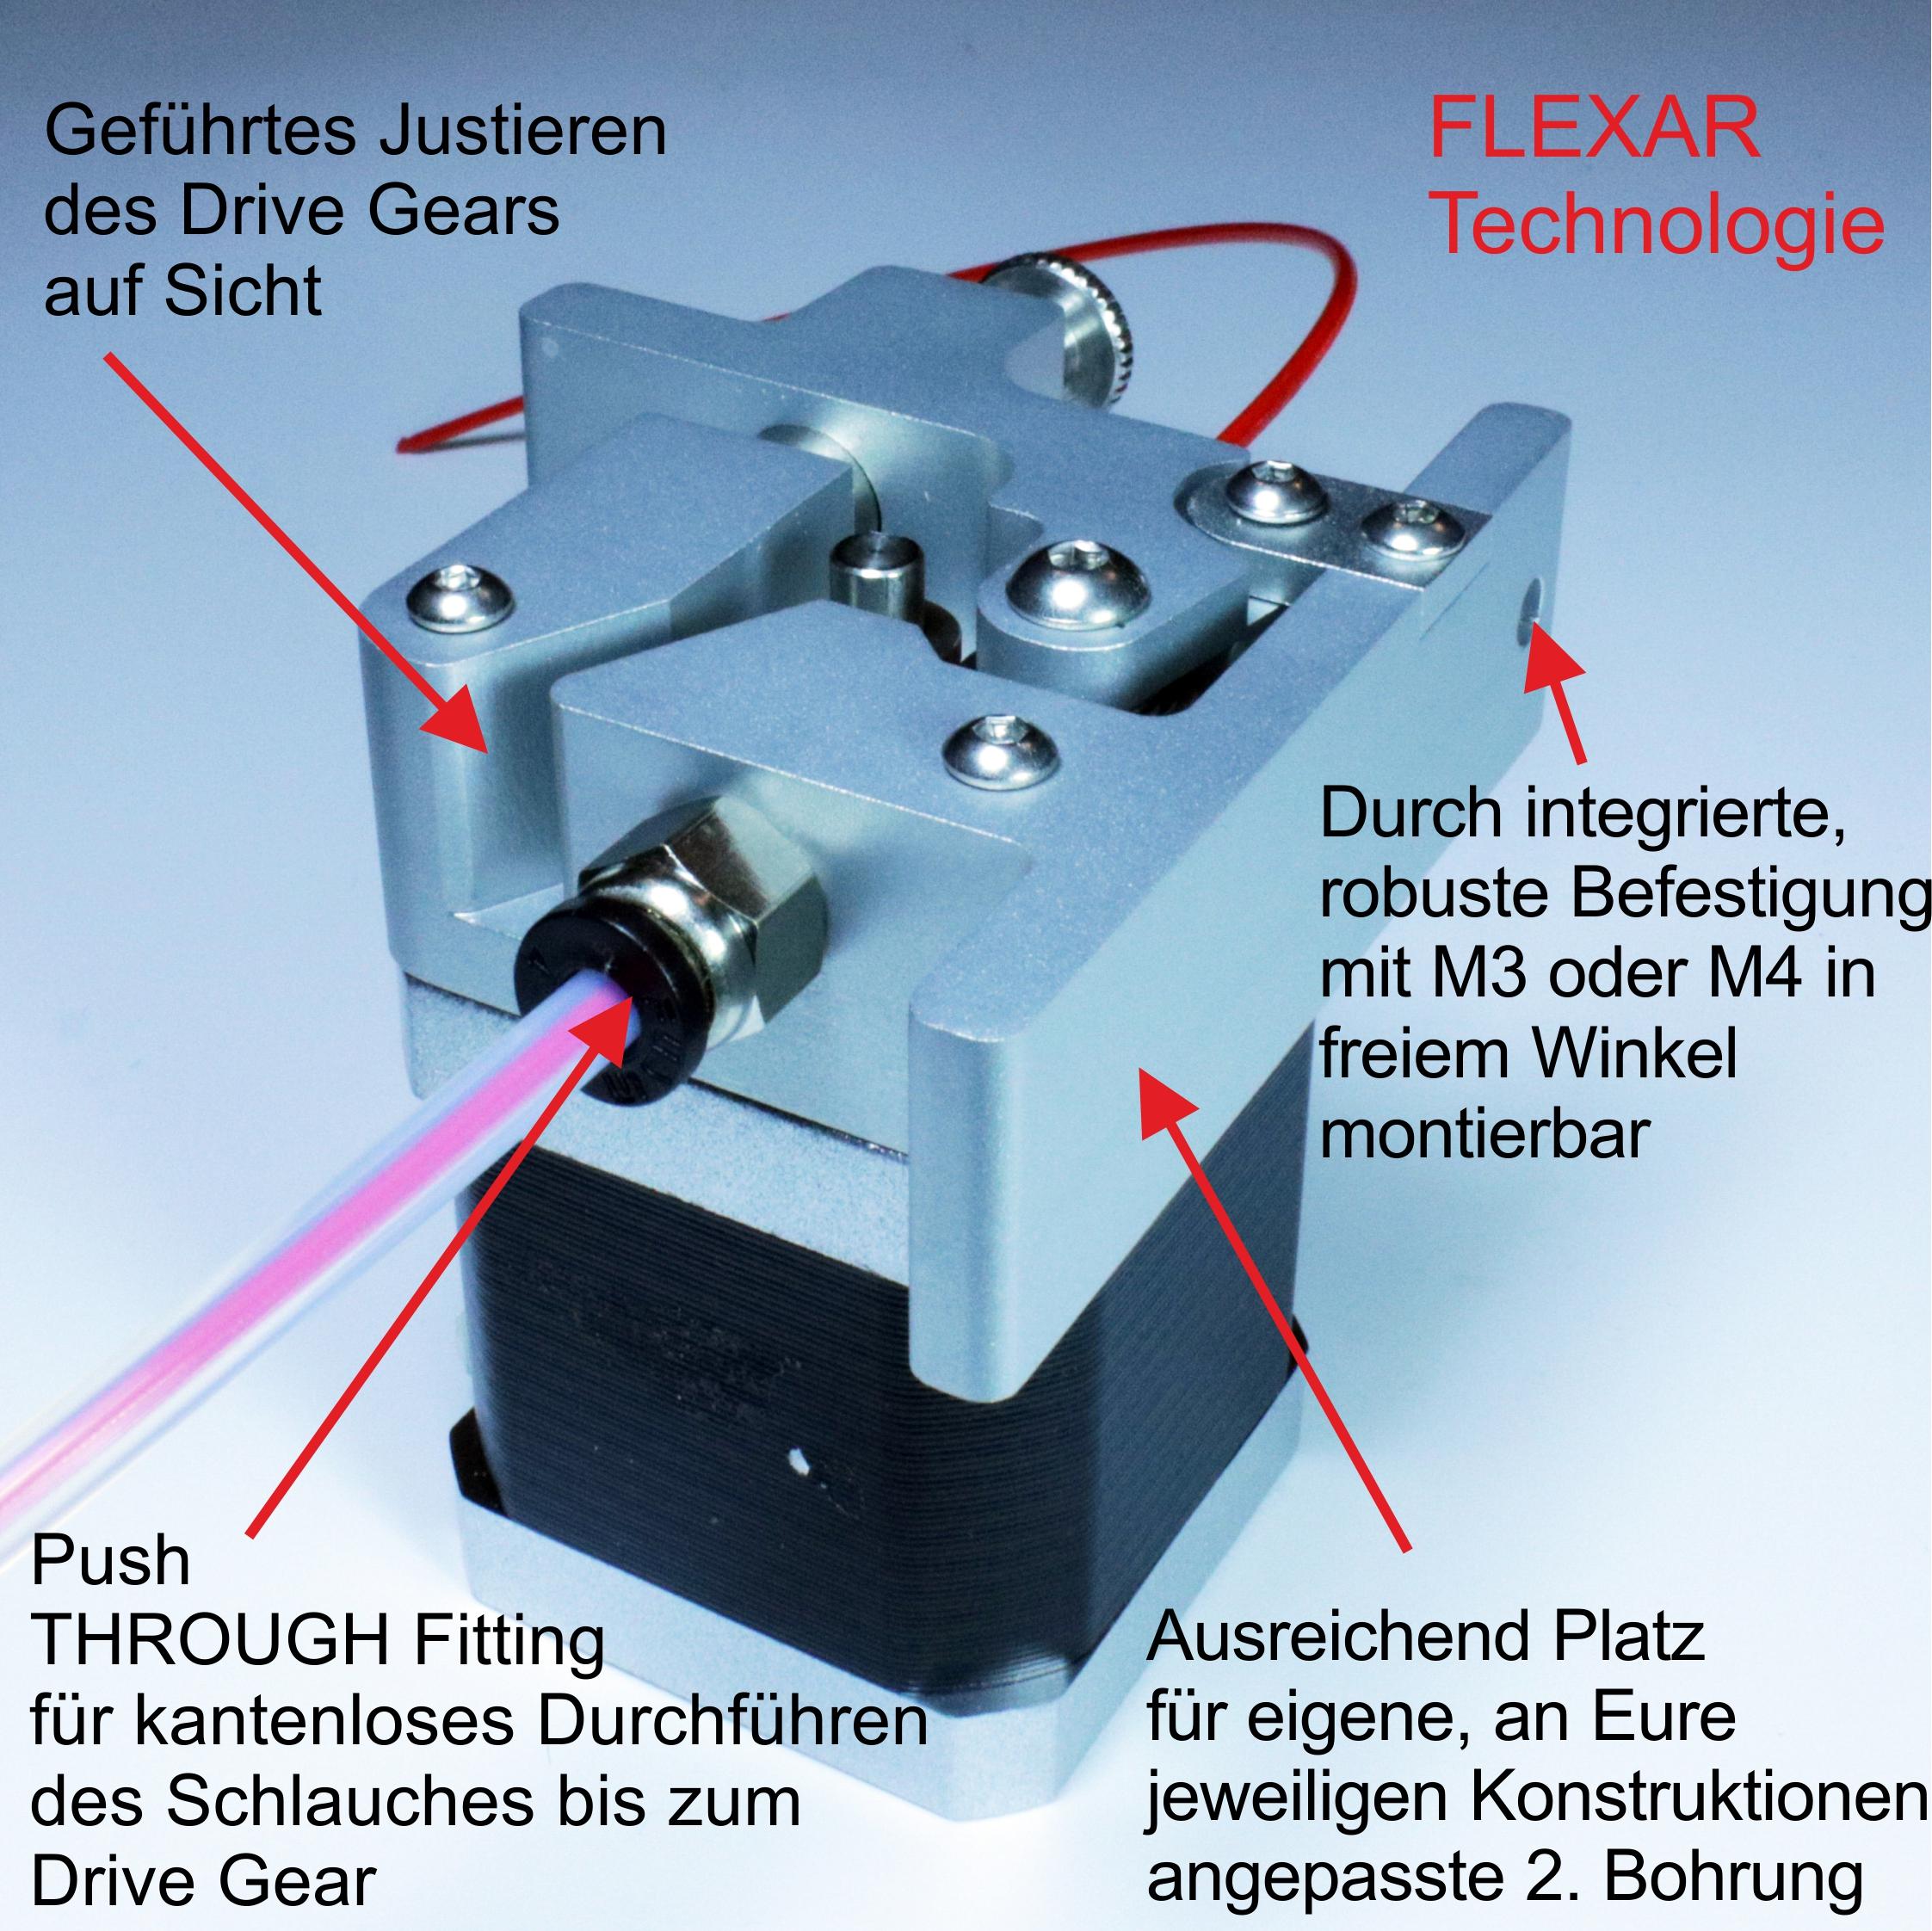 magnetic-alu-flexar-extruder-erklaerung-1Bg2Enw3iFJb5u